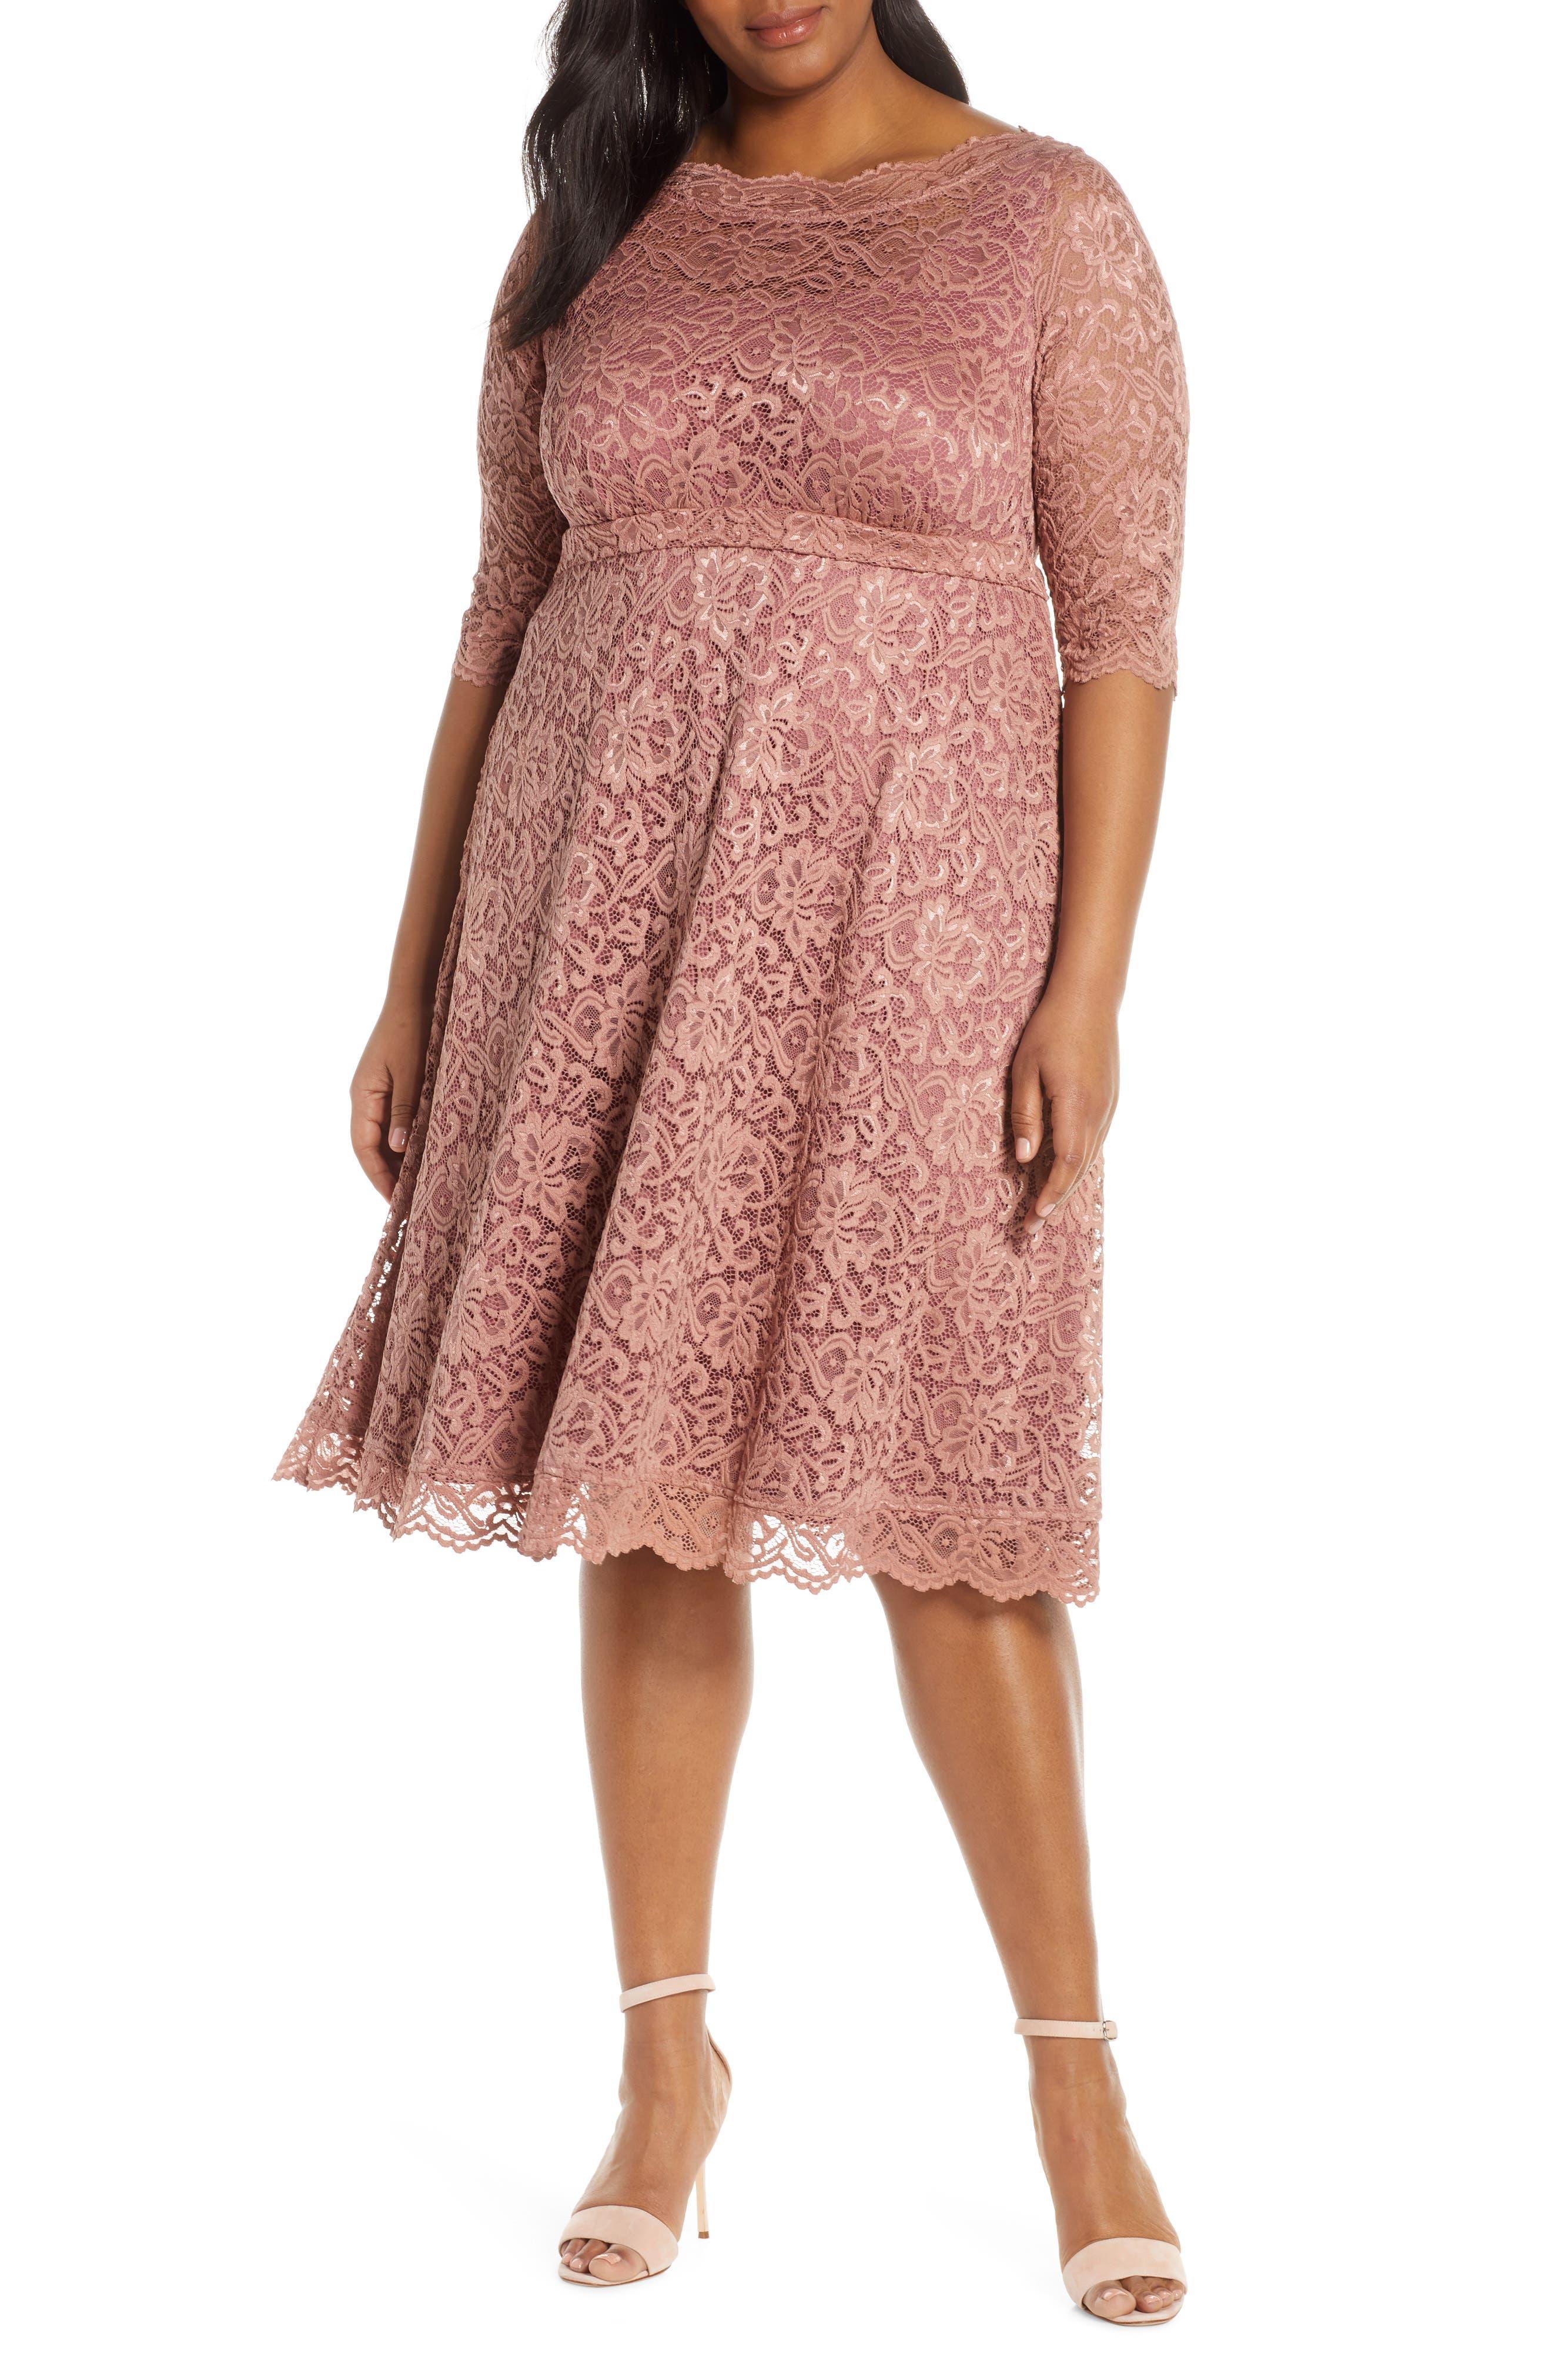 Plus Size Kiyonna Lacy Cocktail Dress, Pink